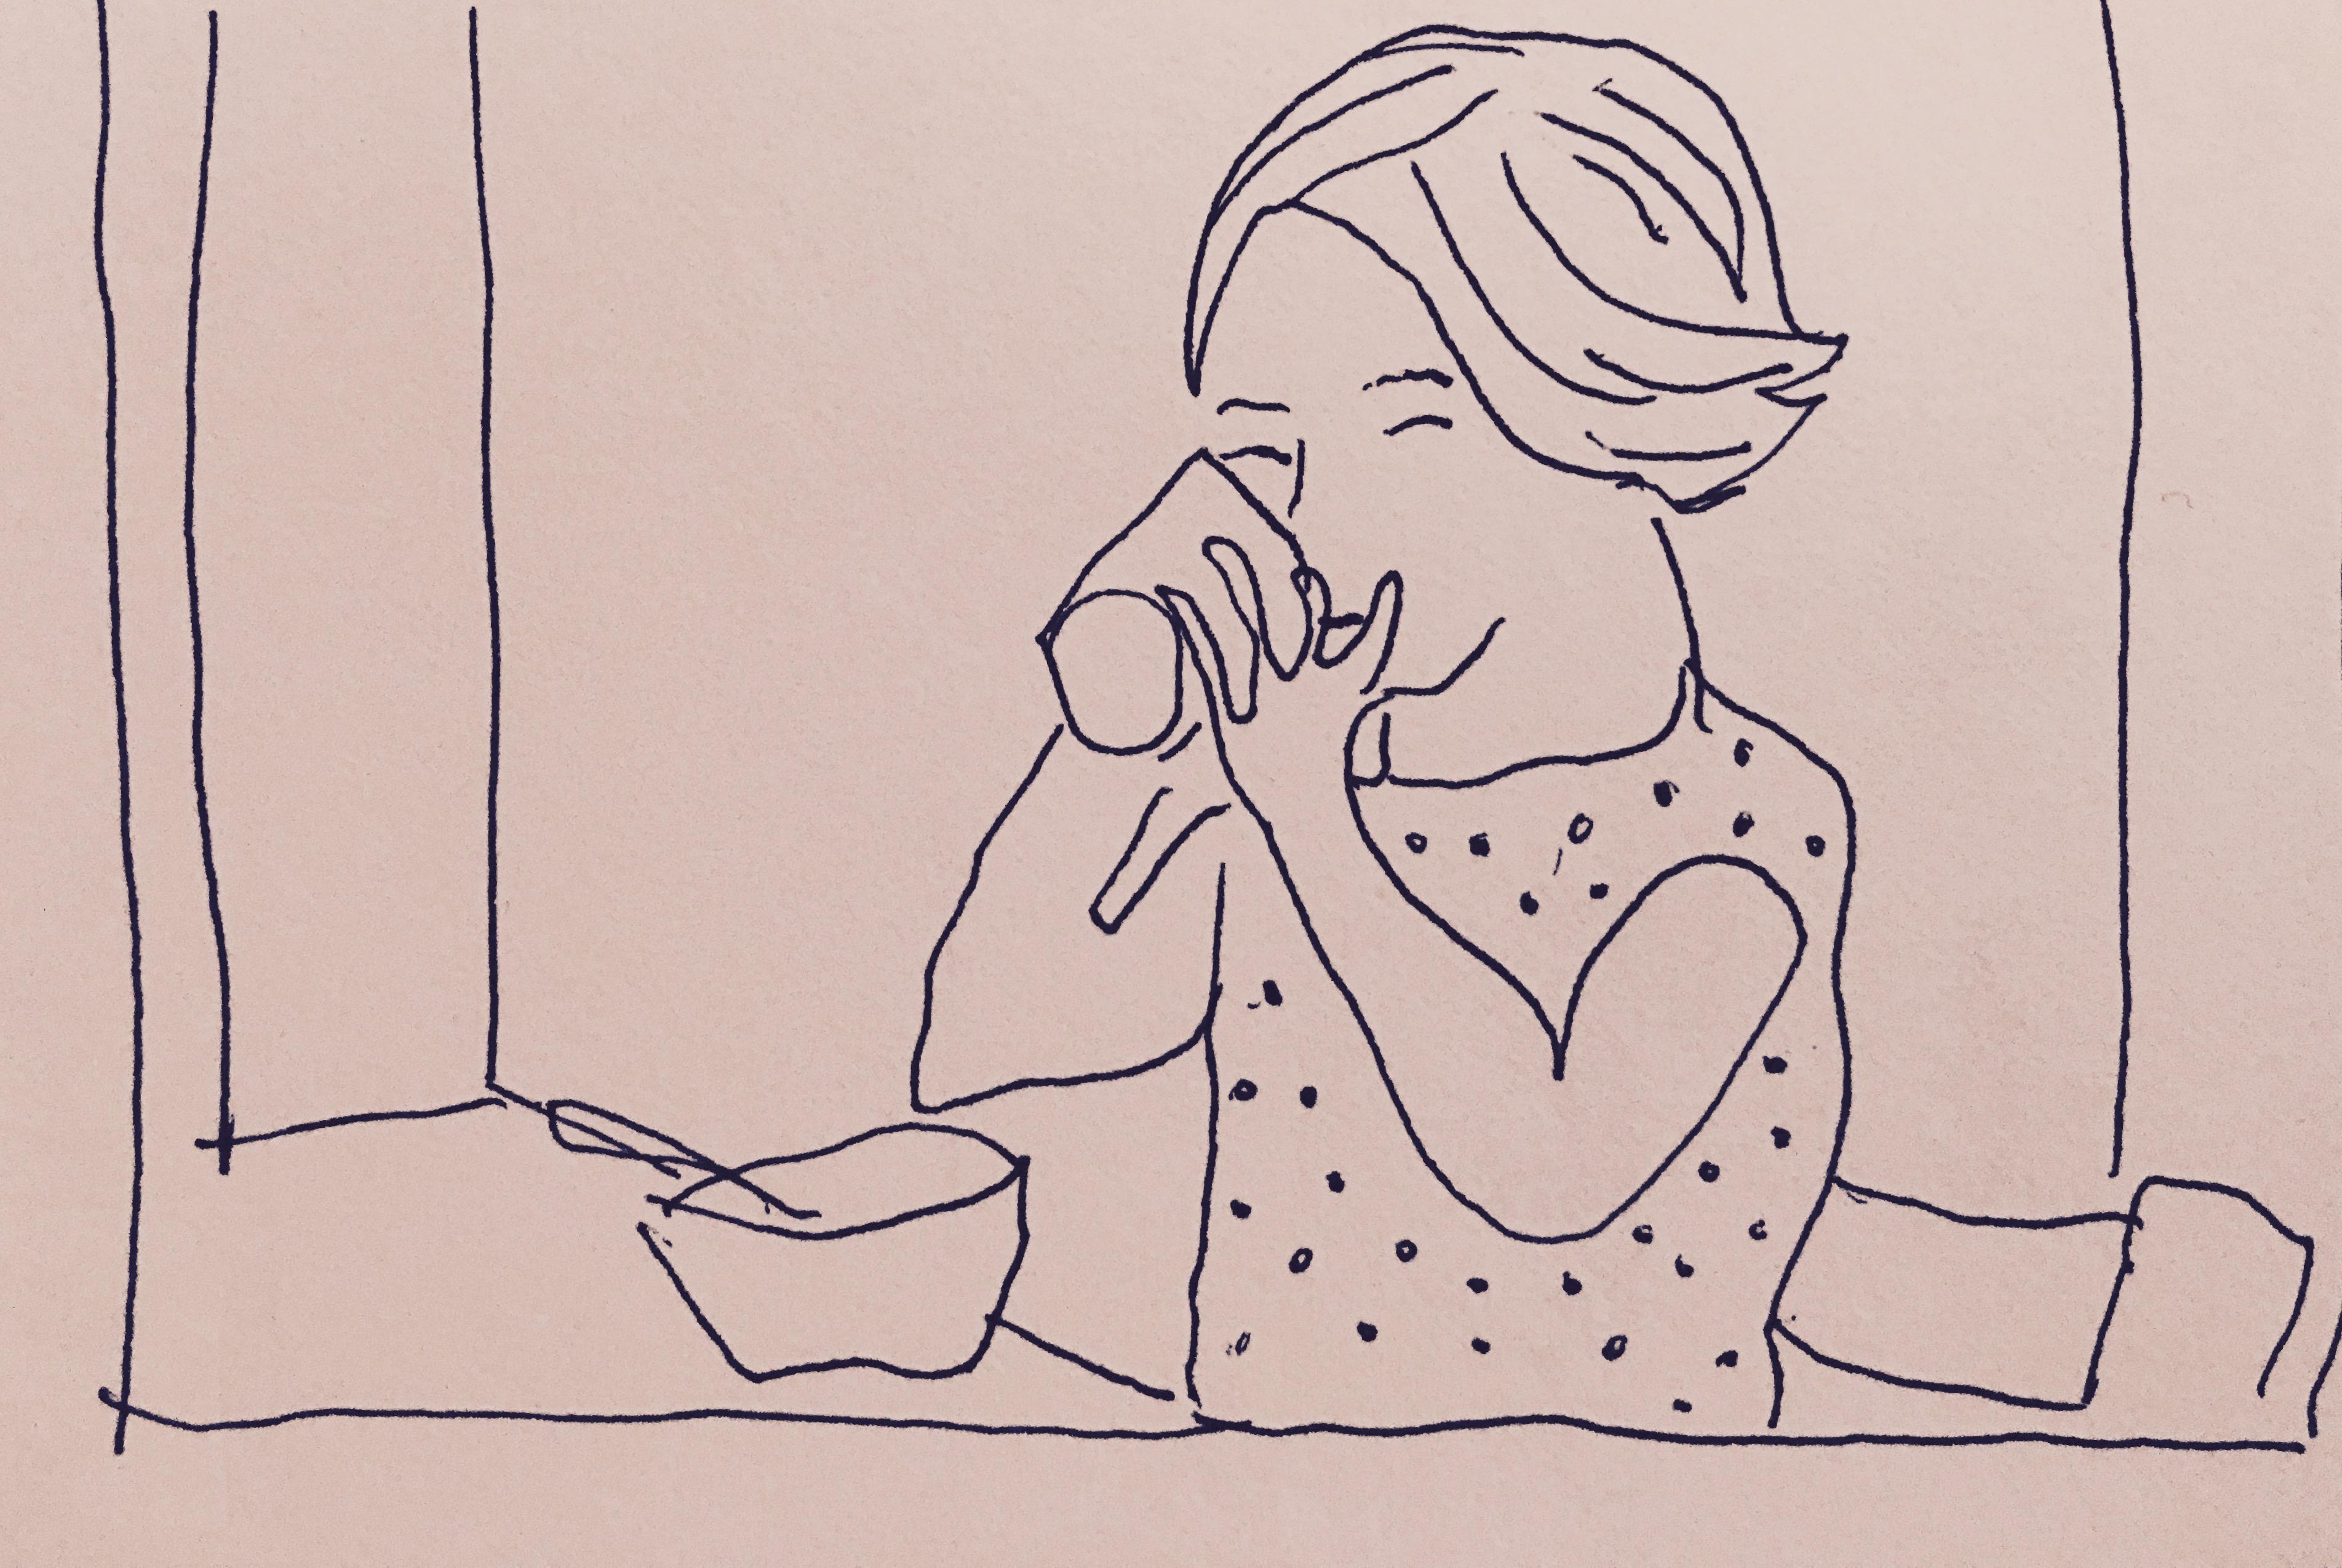 KW 03 Poised Child Drinking